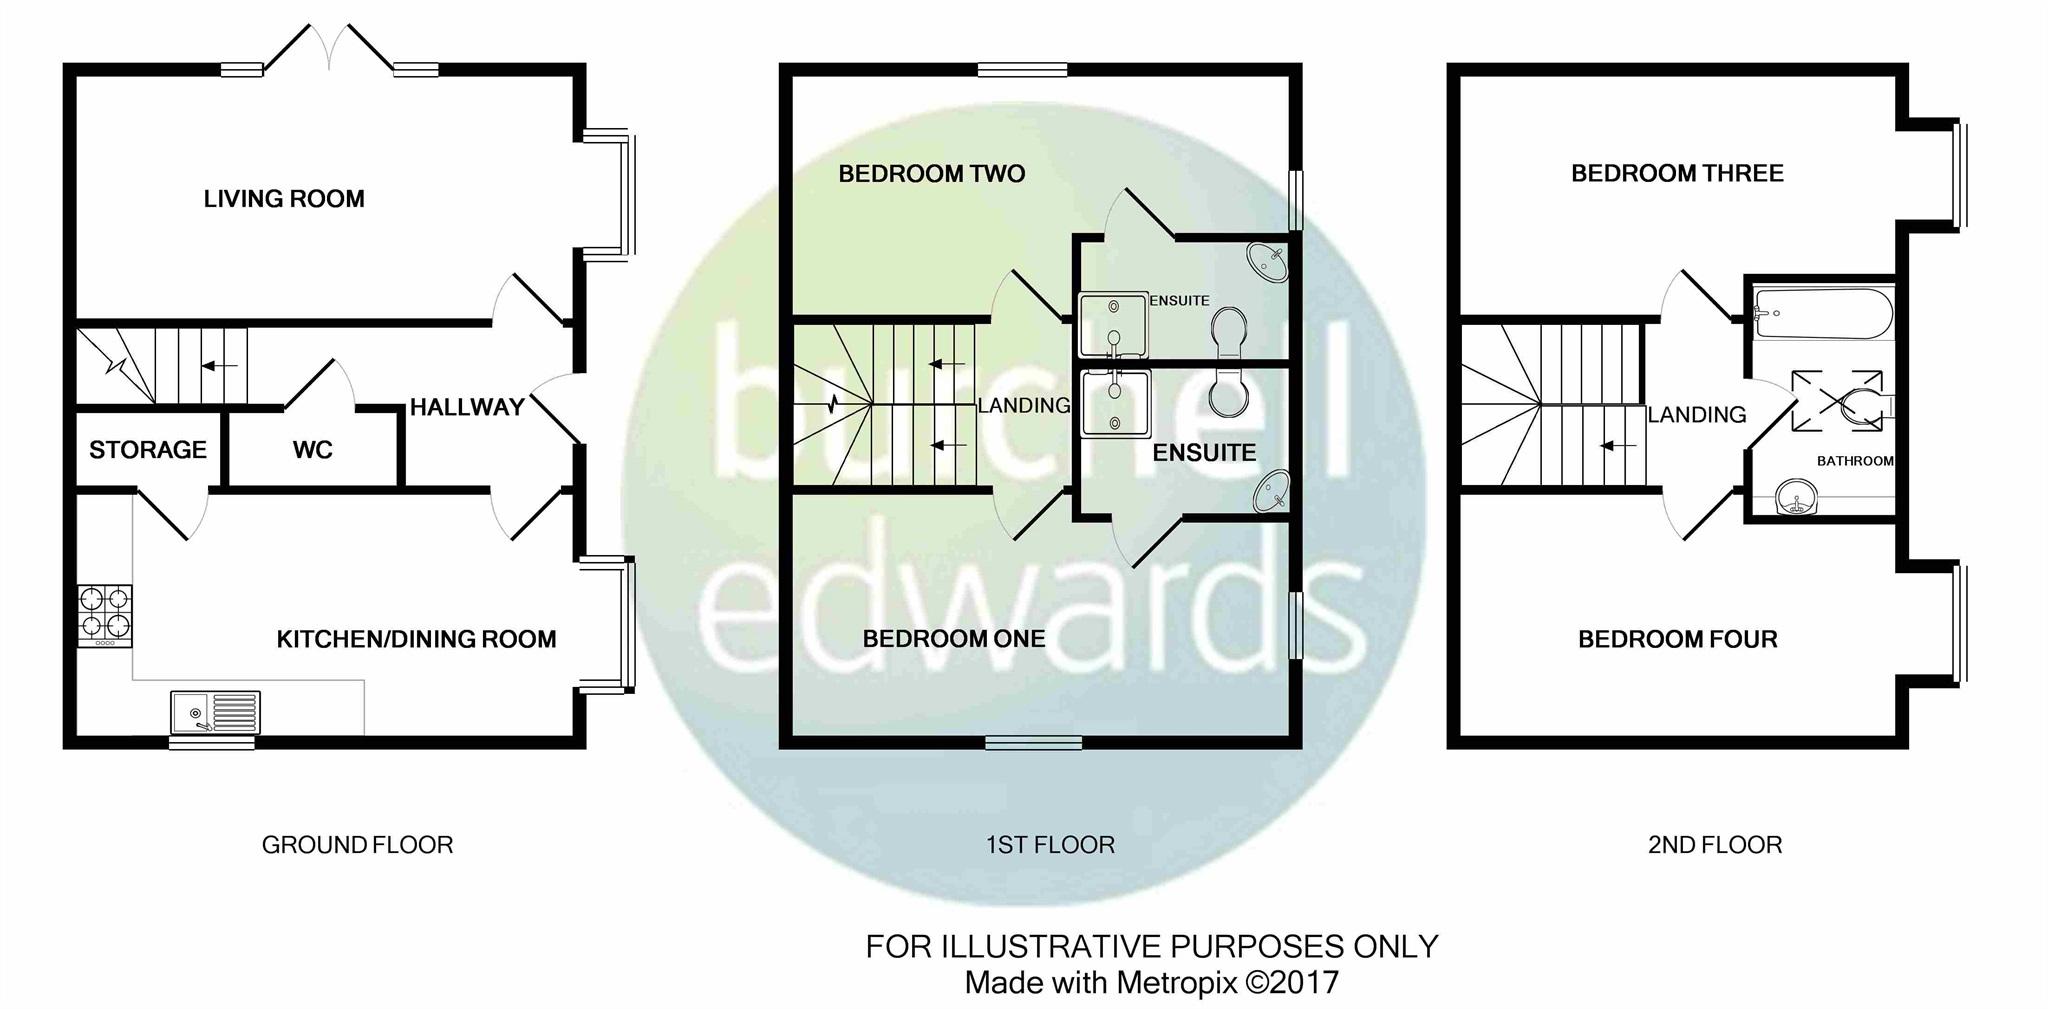 bromford road hodge hill birmingham b36 4 bedroom semi. Black Bedroom Furniture Sets. Home Design Ideas